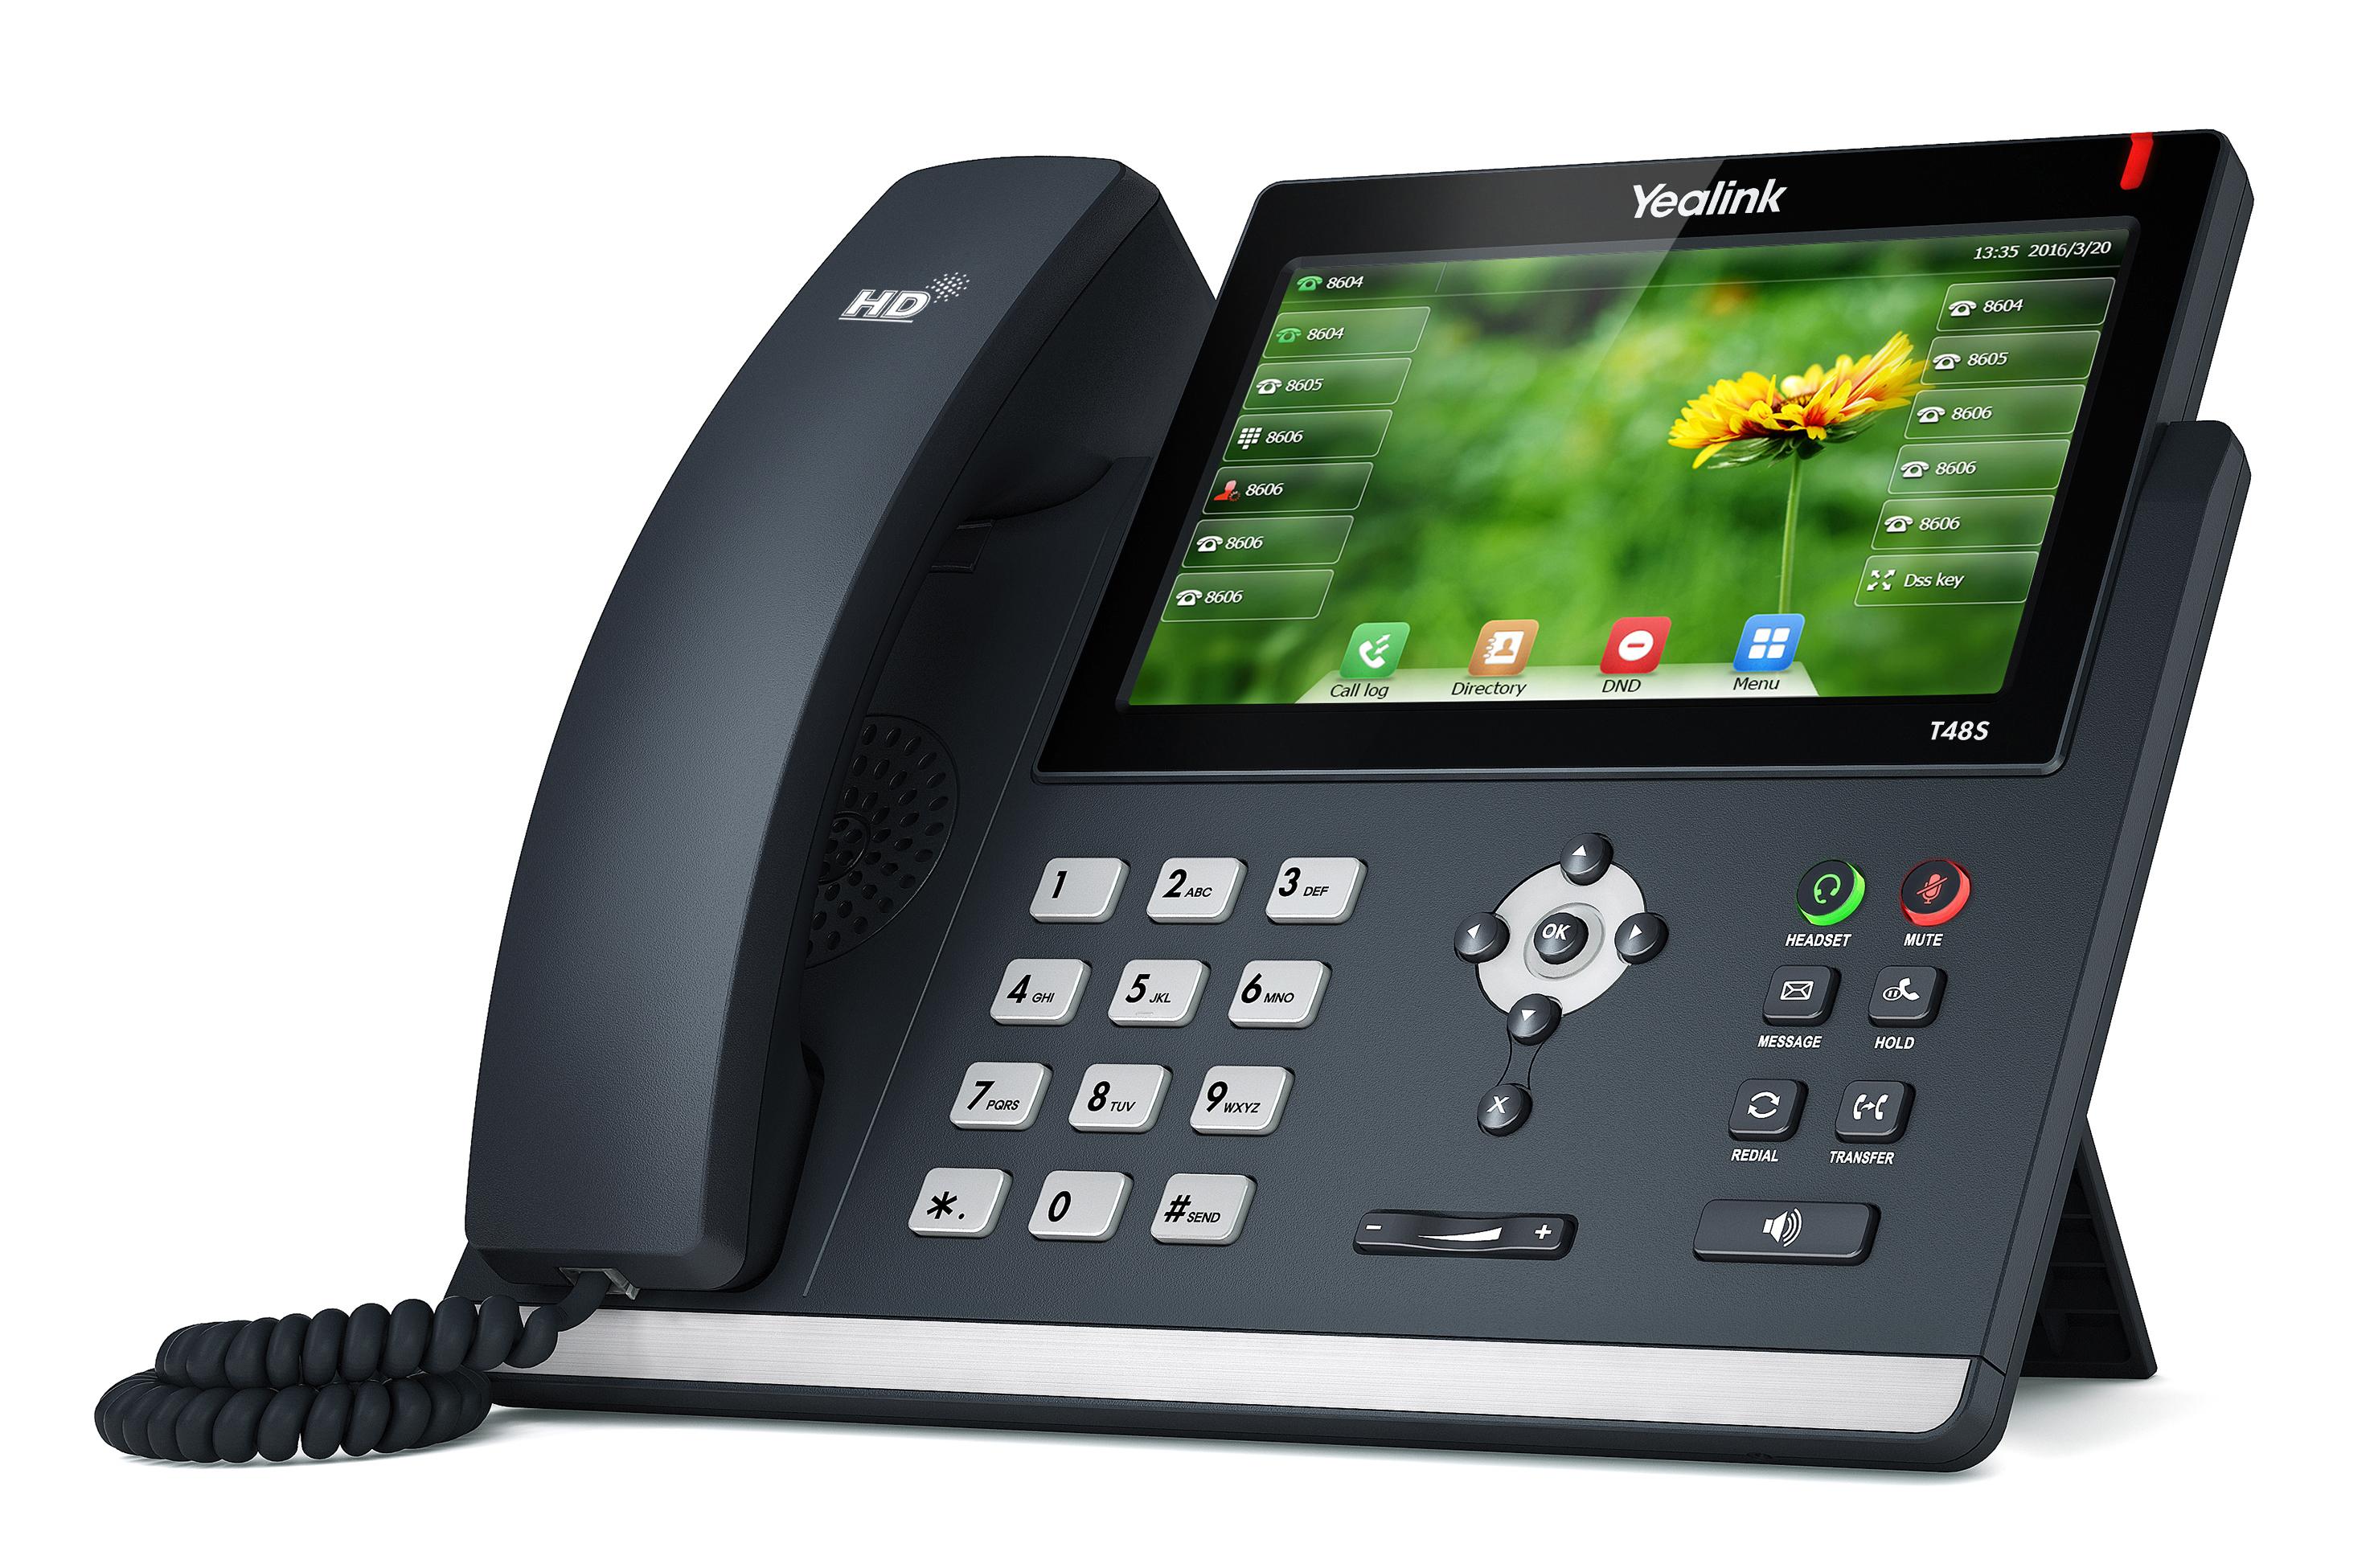 T48S טלפון IP לעסקים yealink ילינק